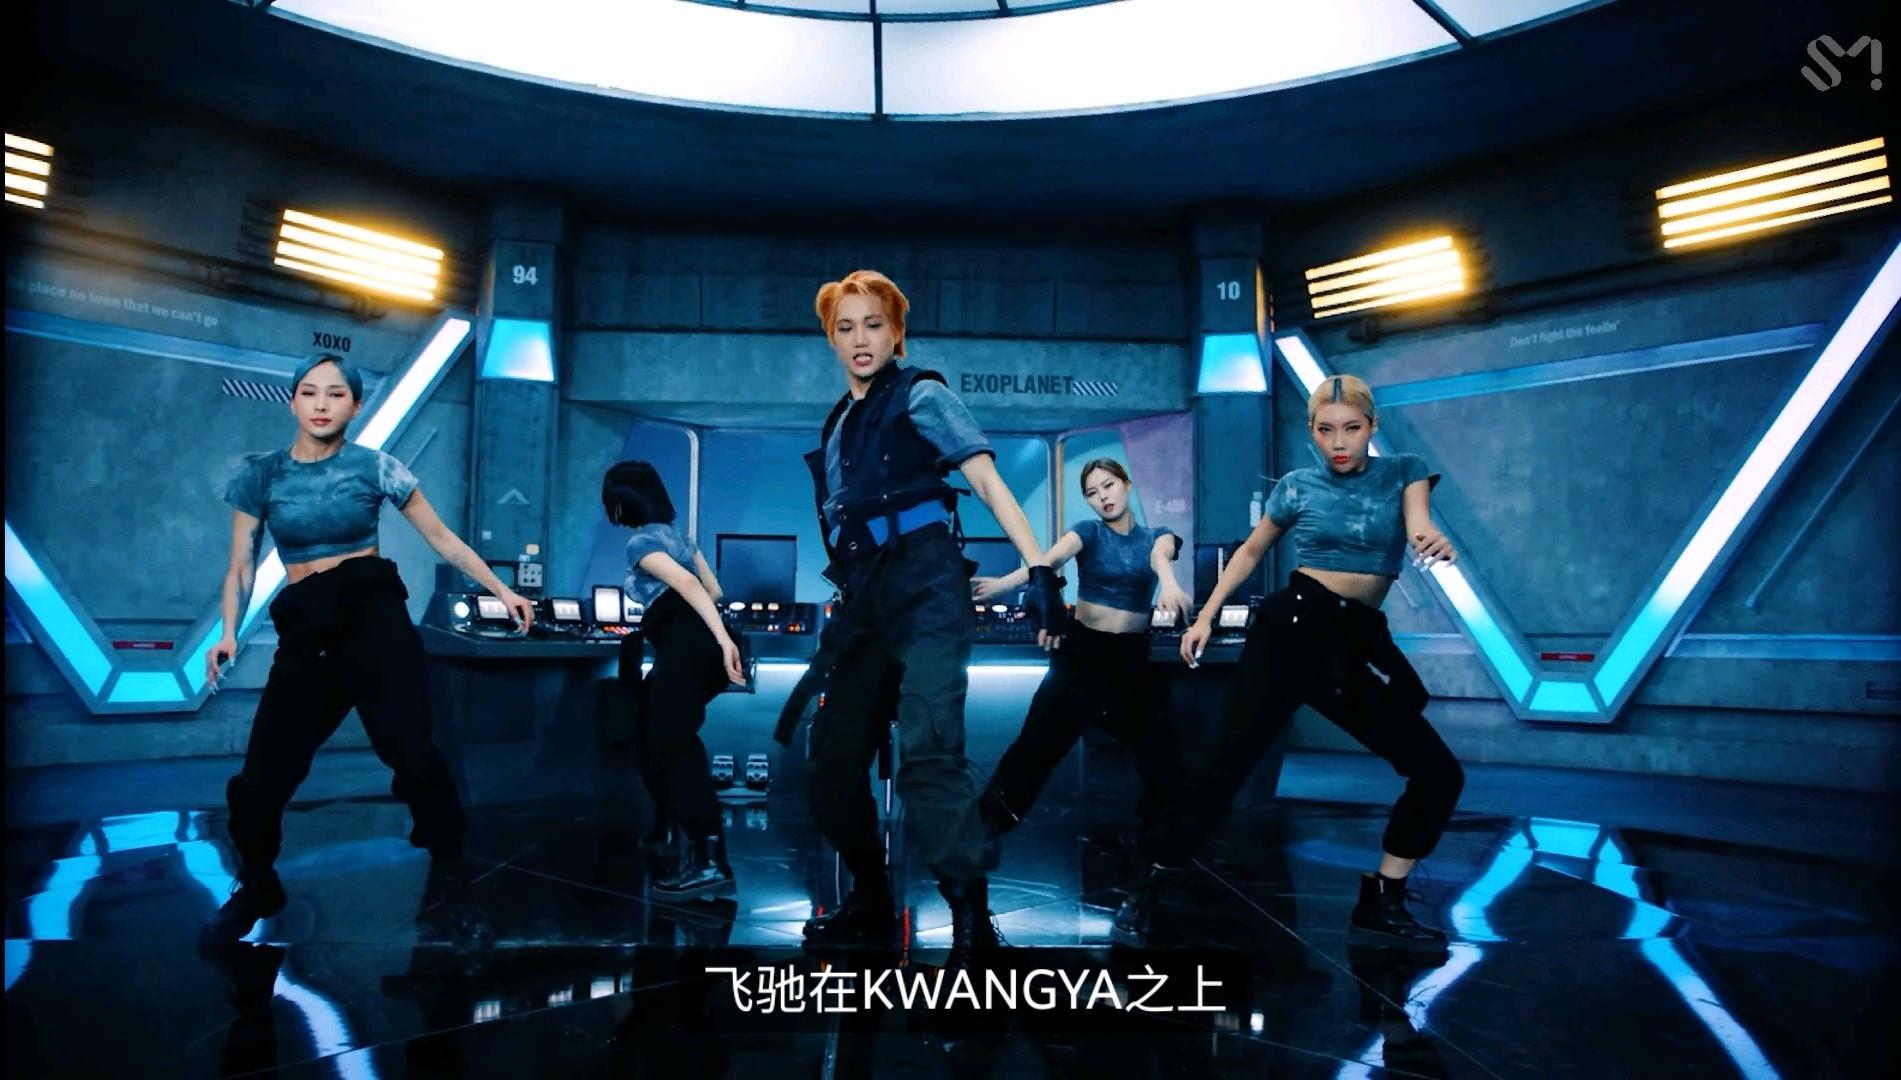 SM新公司内部照片公开,EXO NCT aespa歌词传说中的旷野是这规模吗